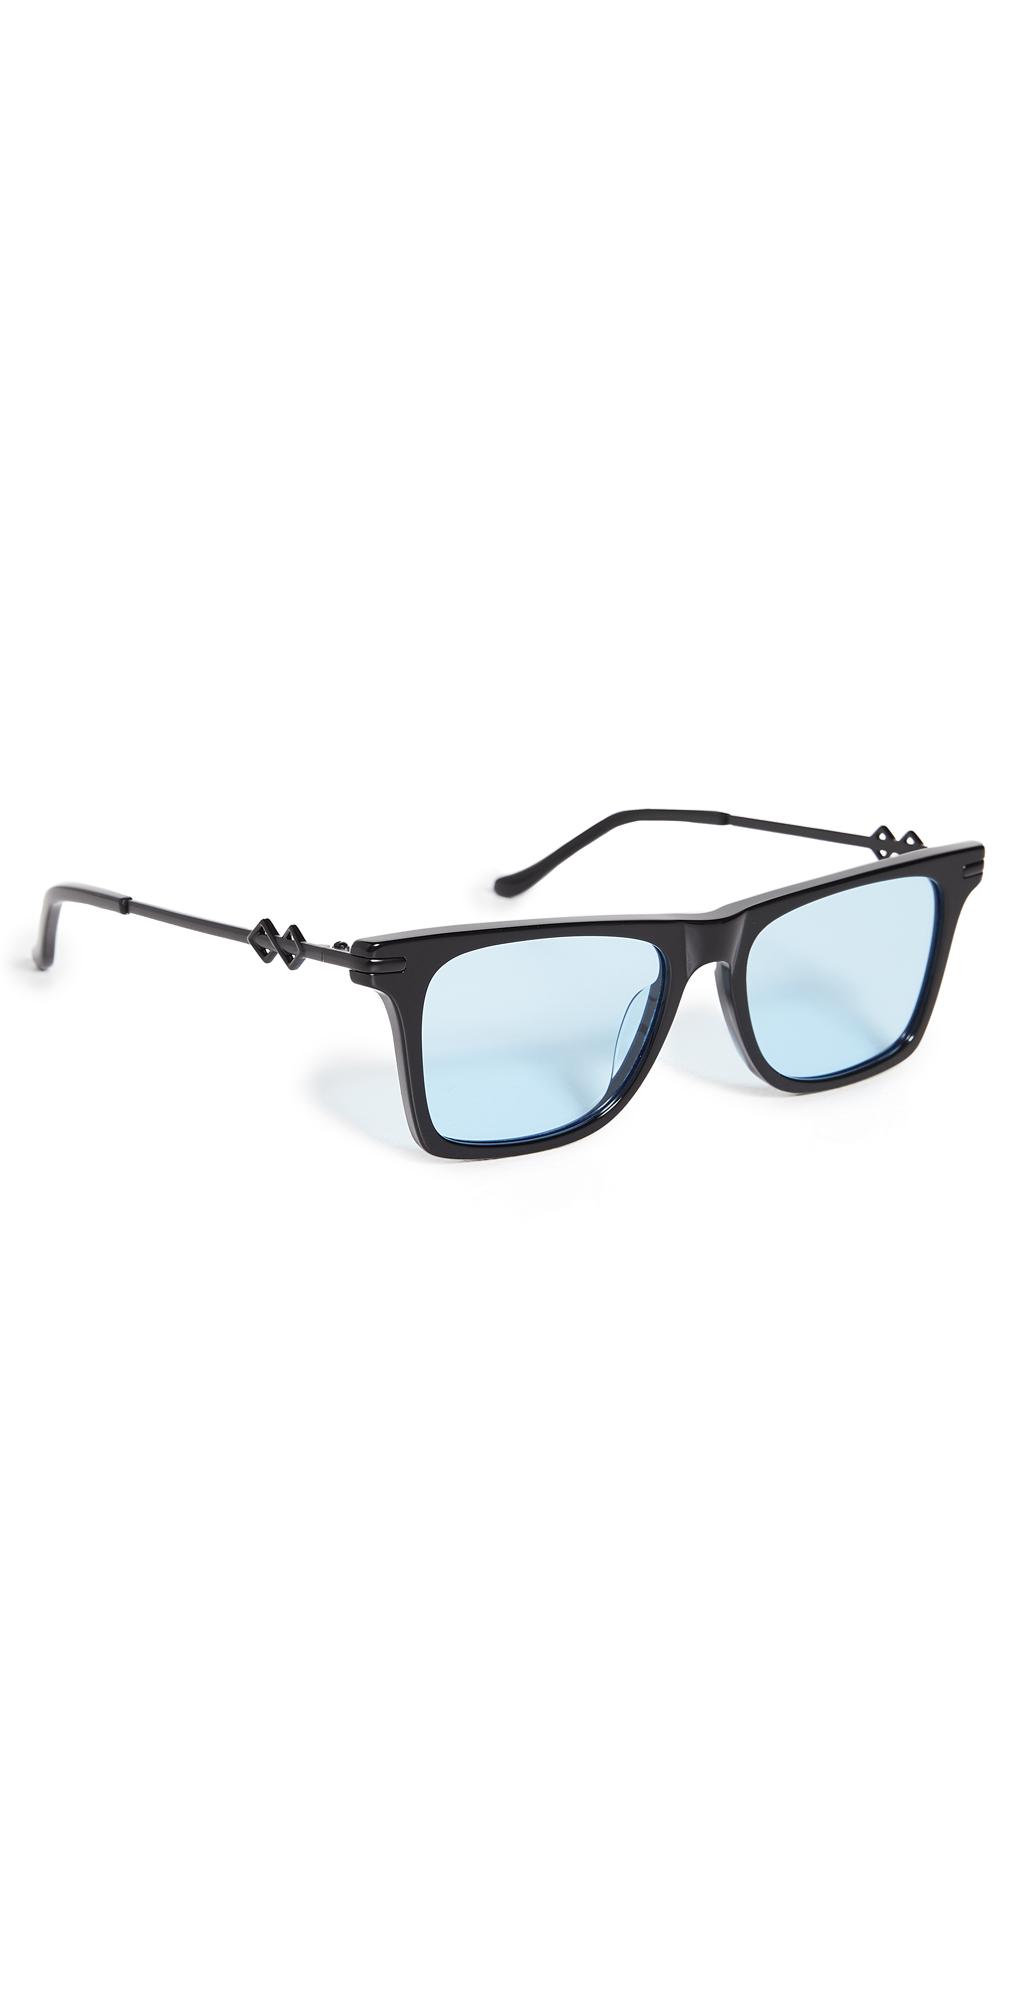 Harper 2.0 Sunglasses